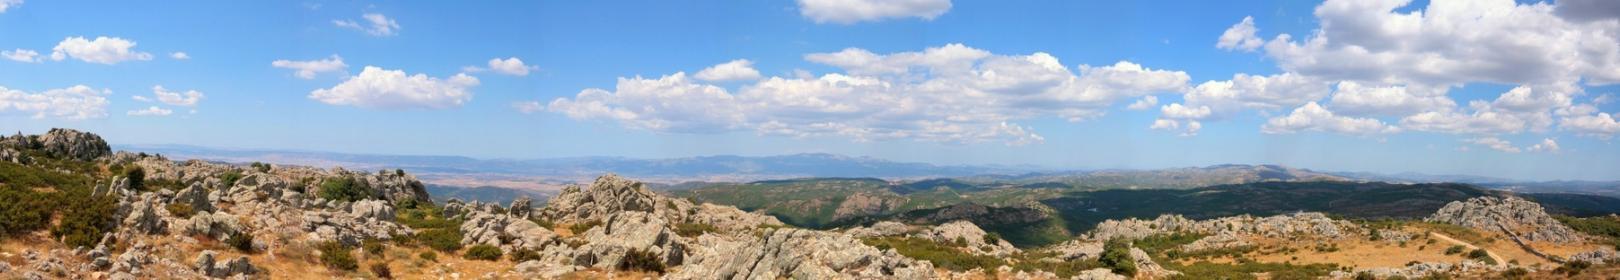 Panoramica monte Lerno (archivio horus, Ente Foreste)